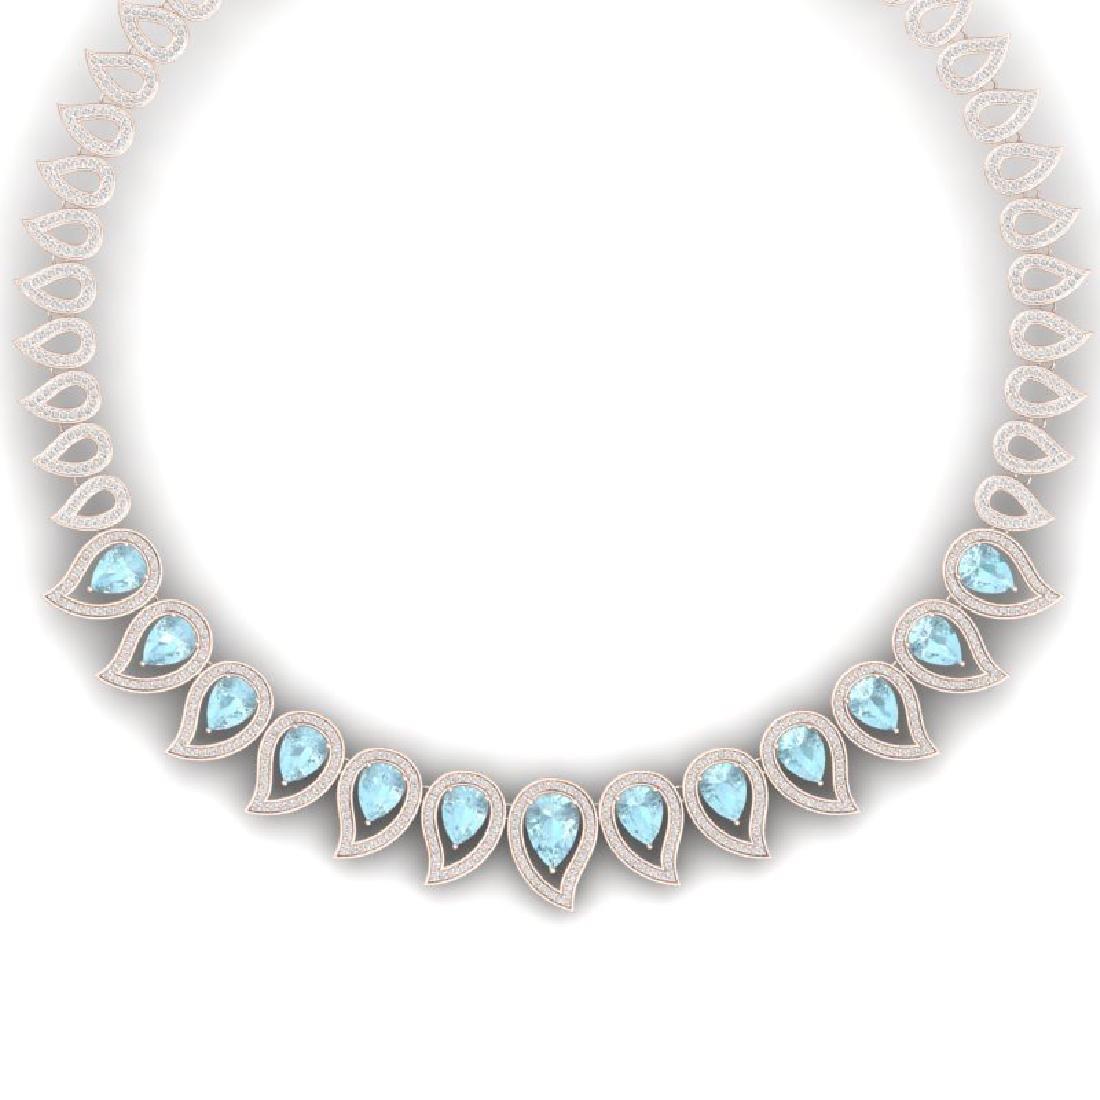 34.96 CTW Royalty Sky Topaz & VS Diamond Necklace 18K